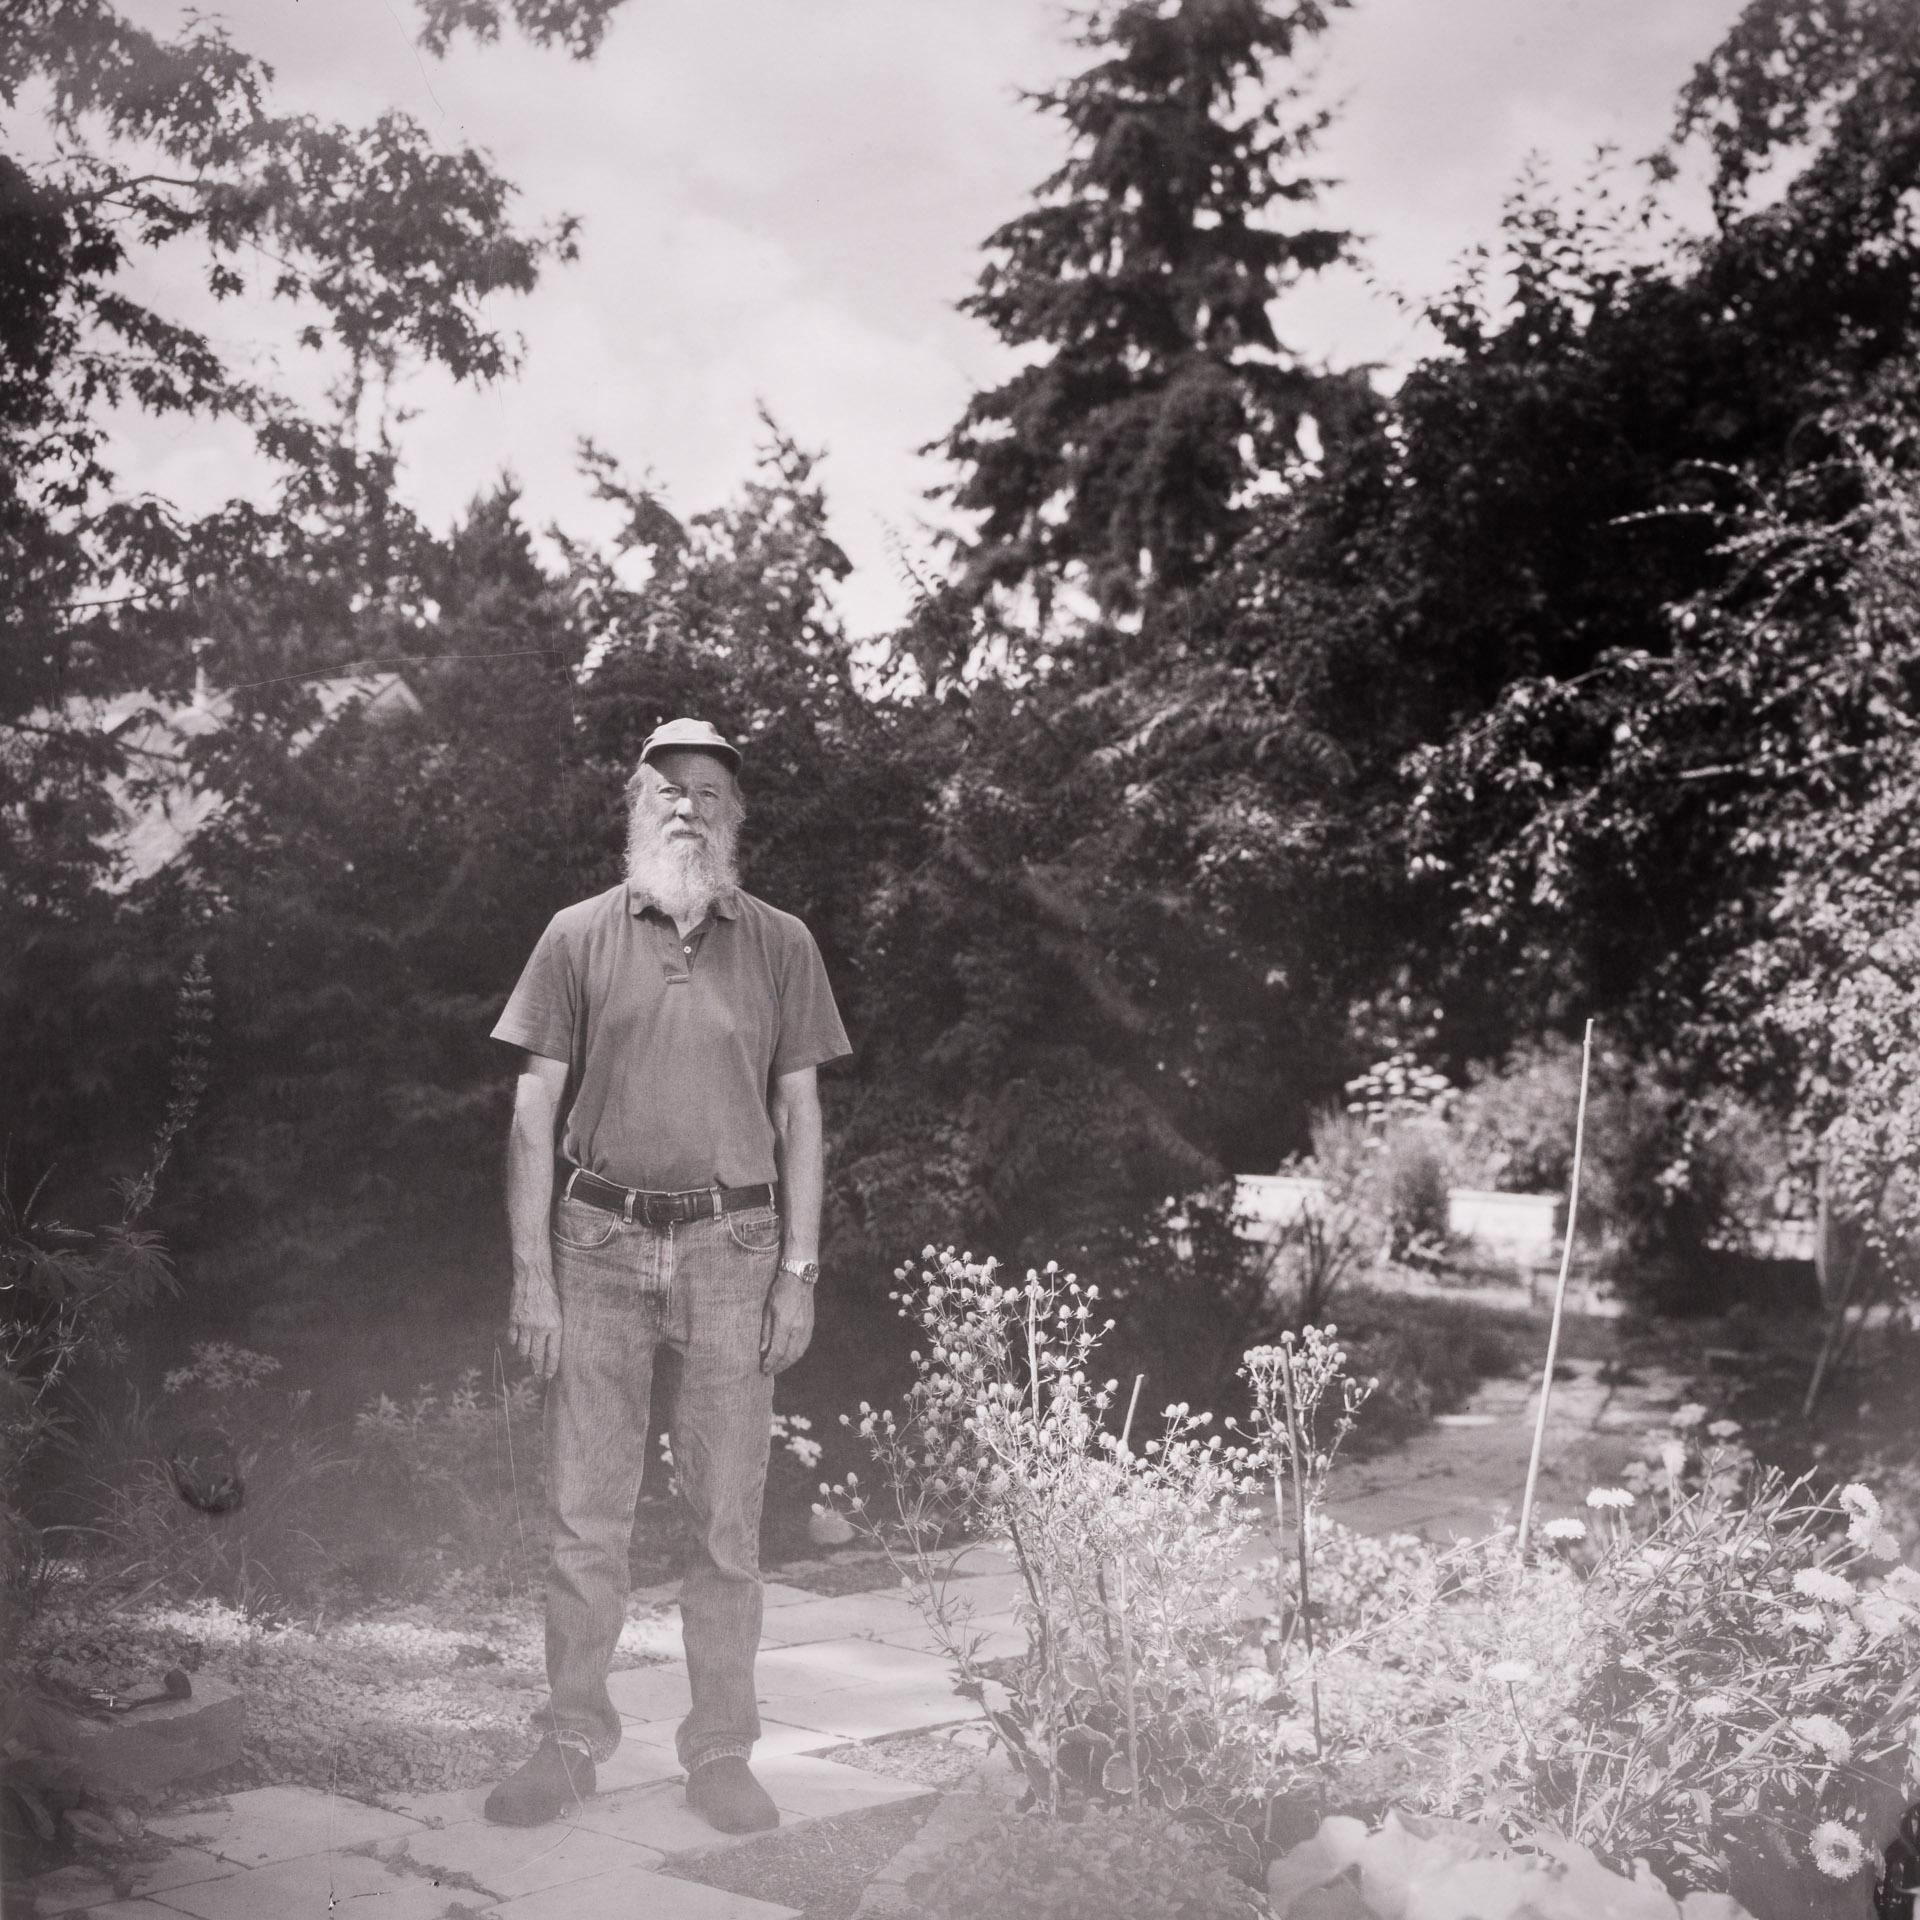 Portrait of Oregon-based woodturner Bill Moore. Photo ©2018 Stephen Takacs